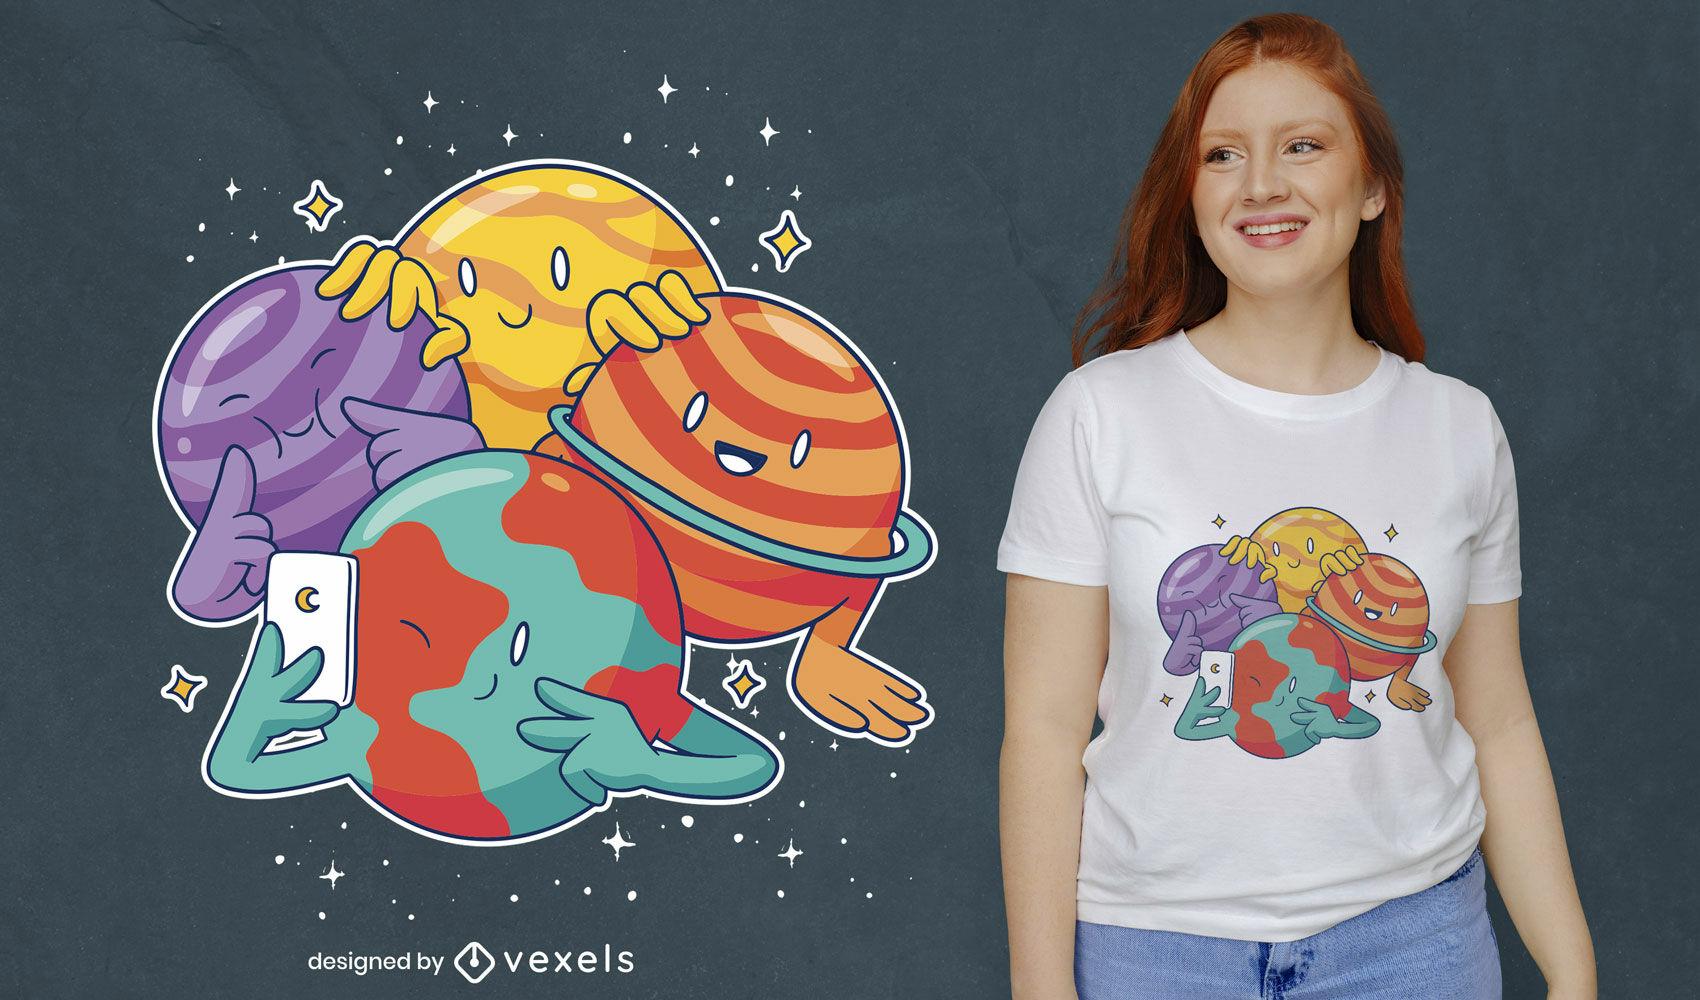 Planetas espacio selfie lindo diseño de camiseta.